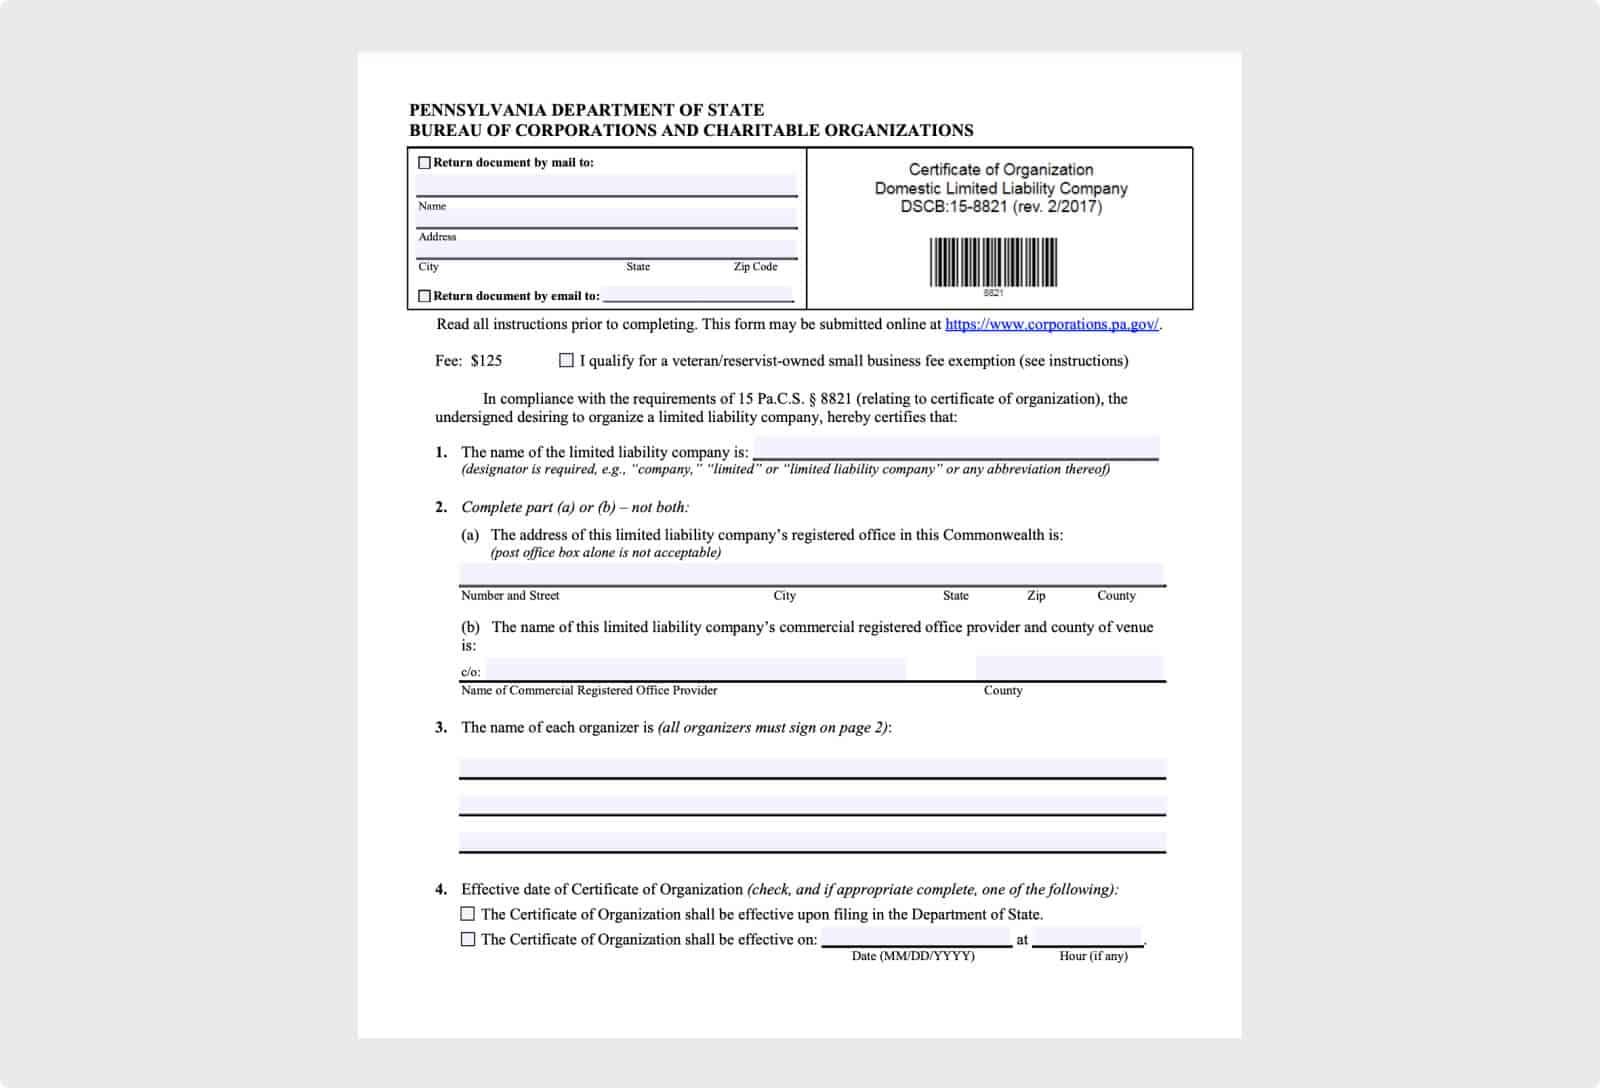 Sample PA LLC Certificate of Organization Form